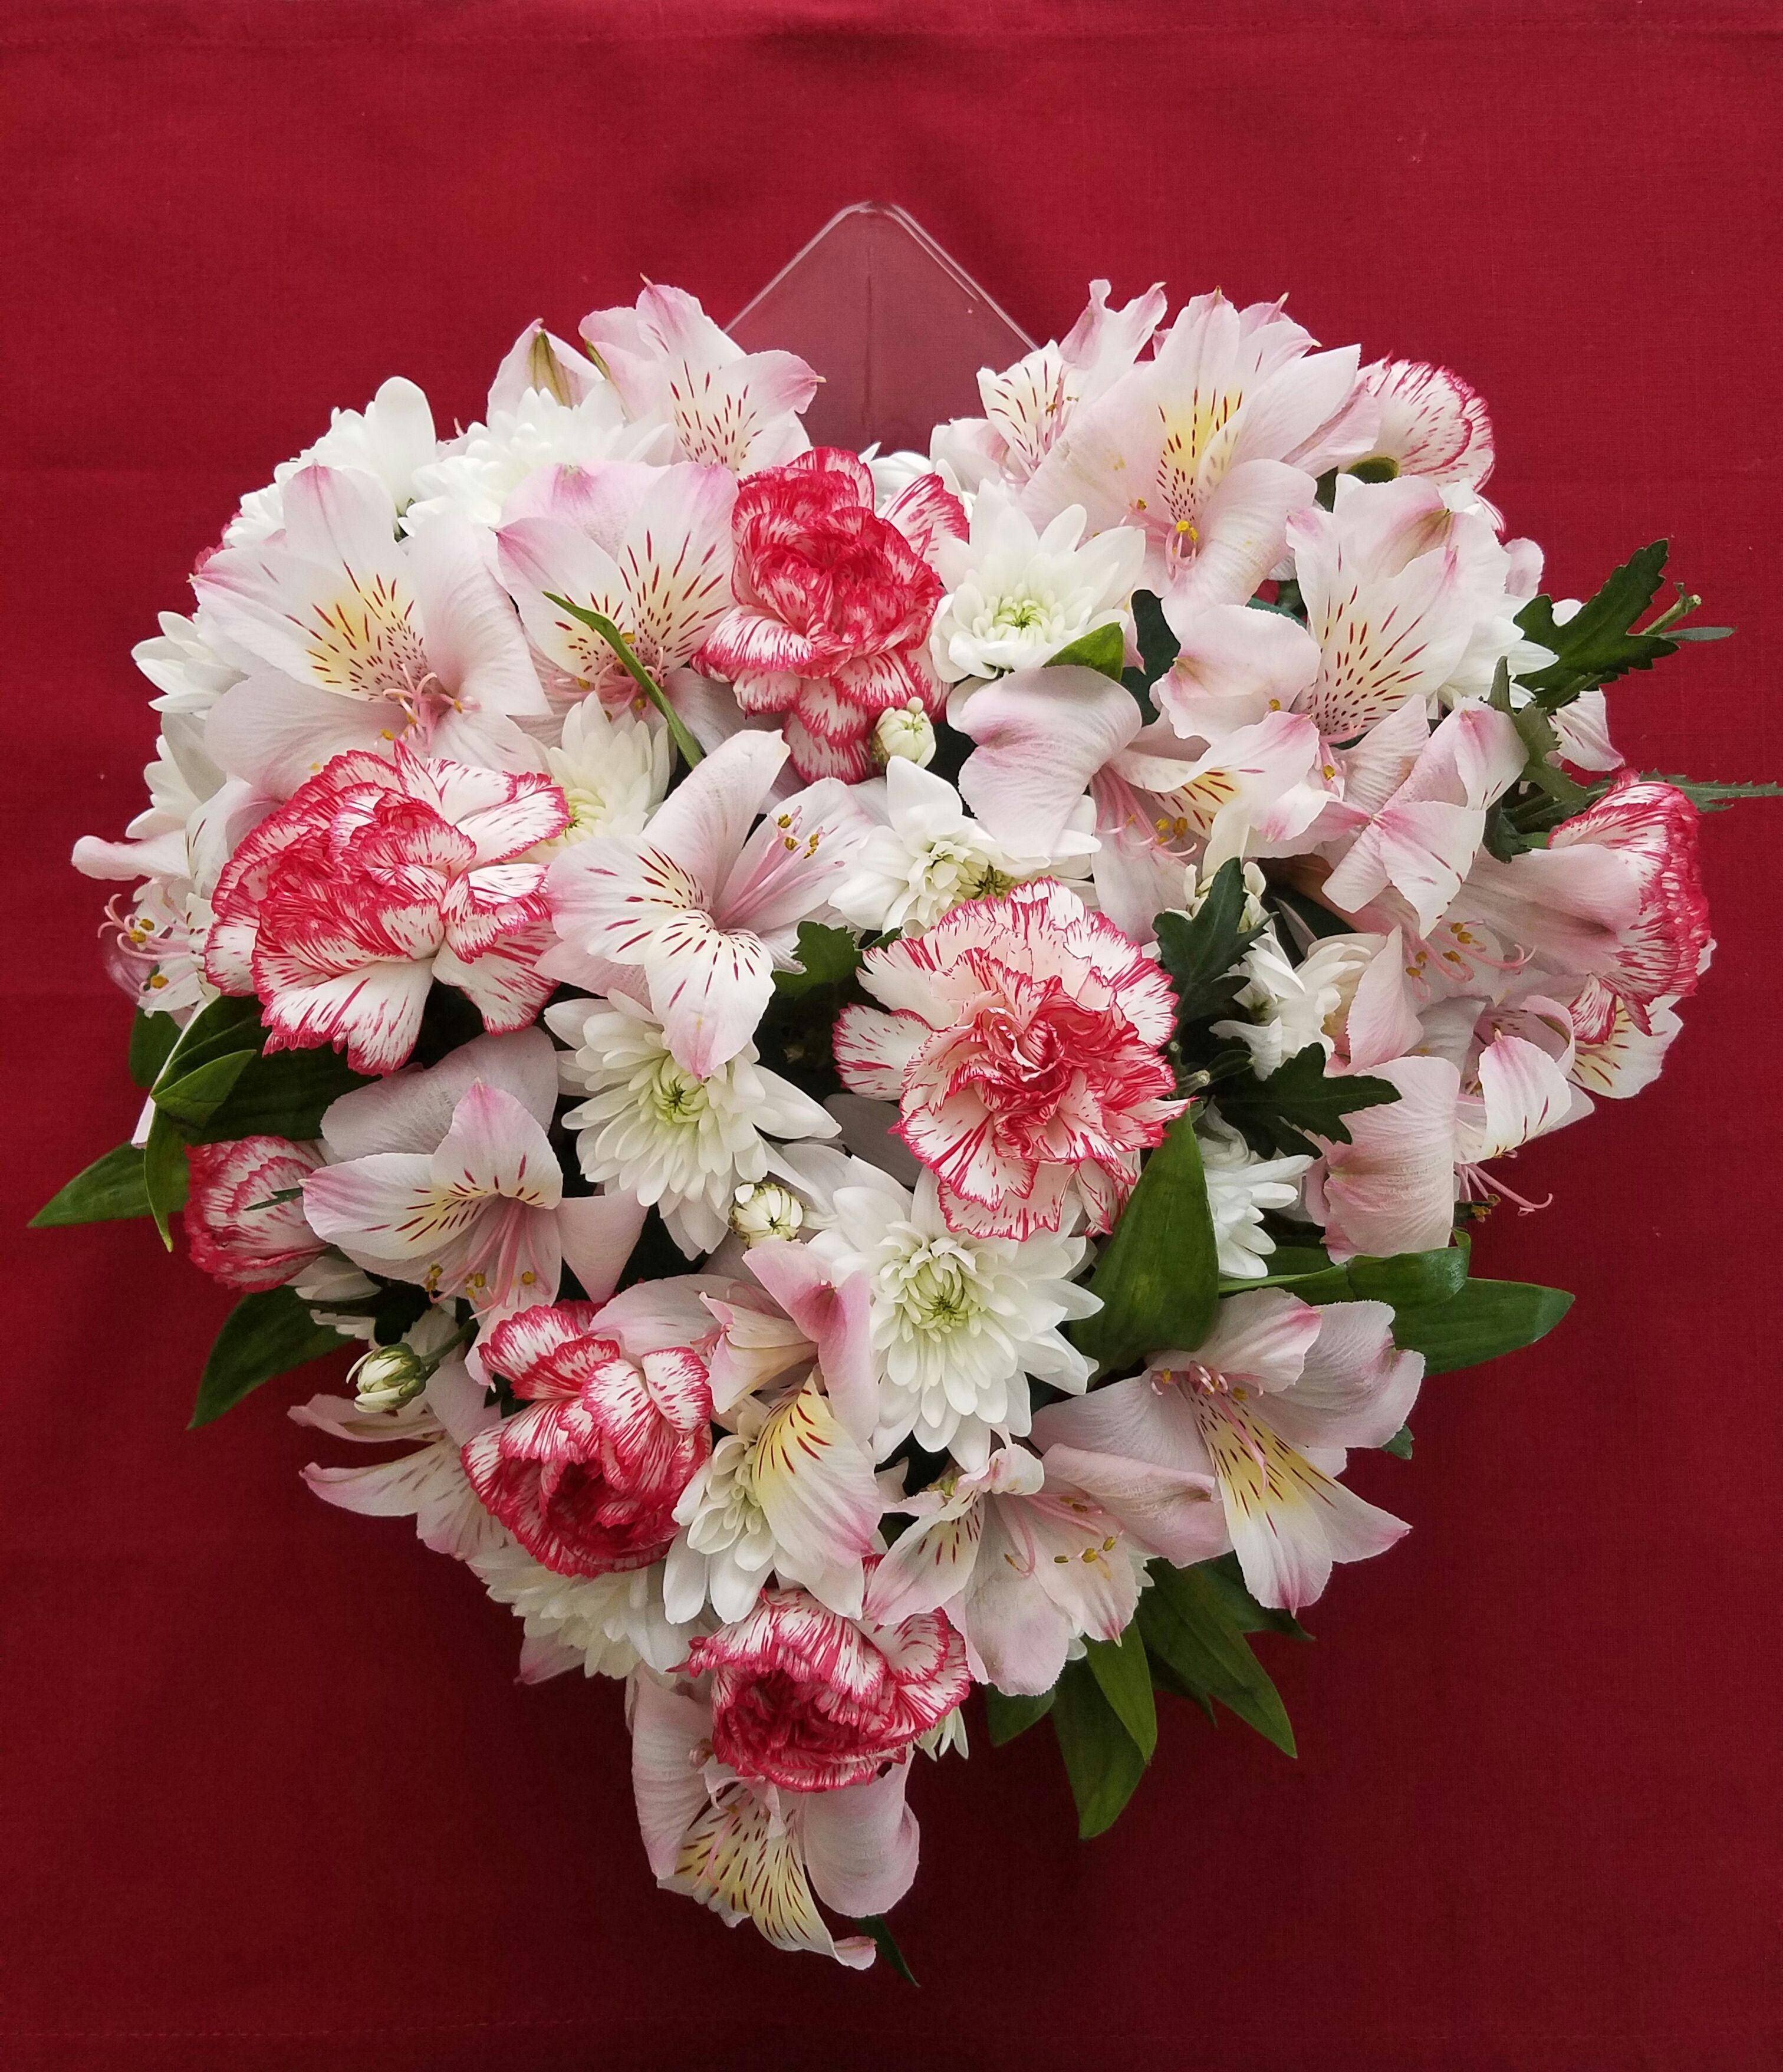 Heart Shaped Floral Centerpiece